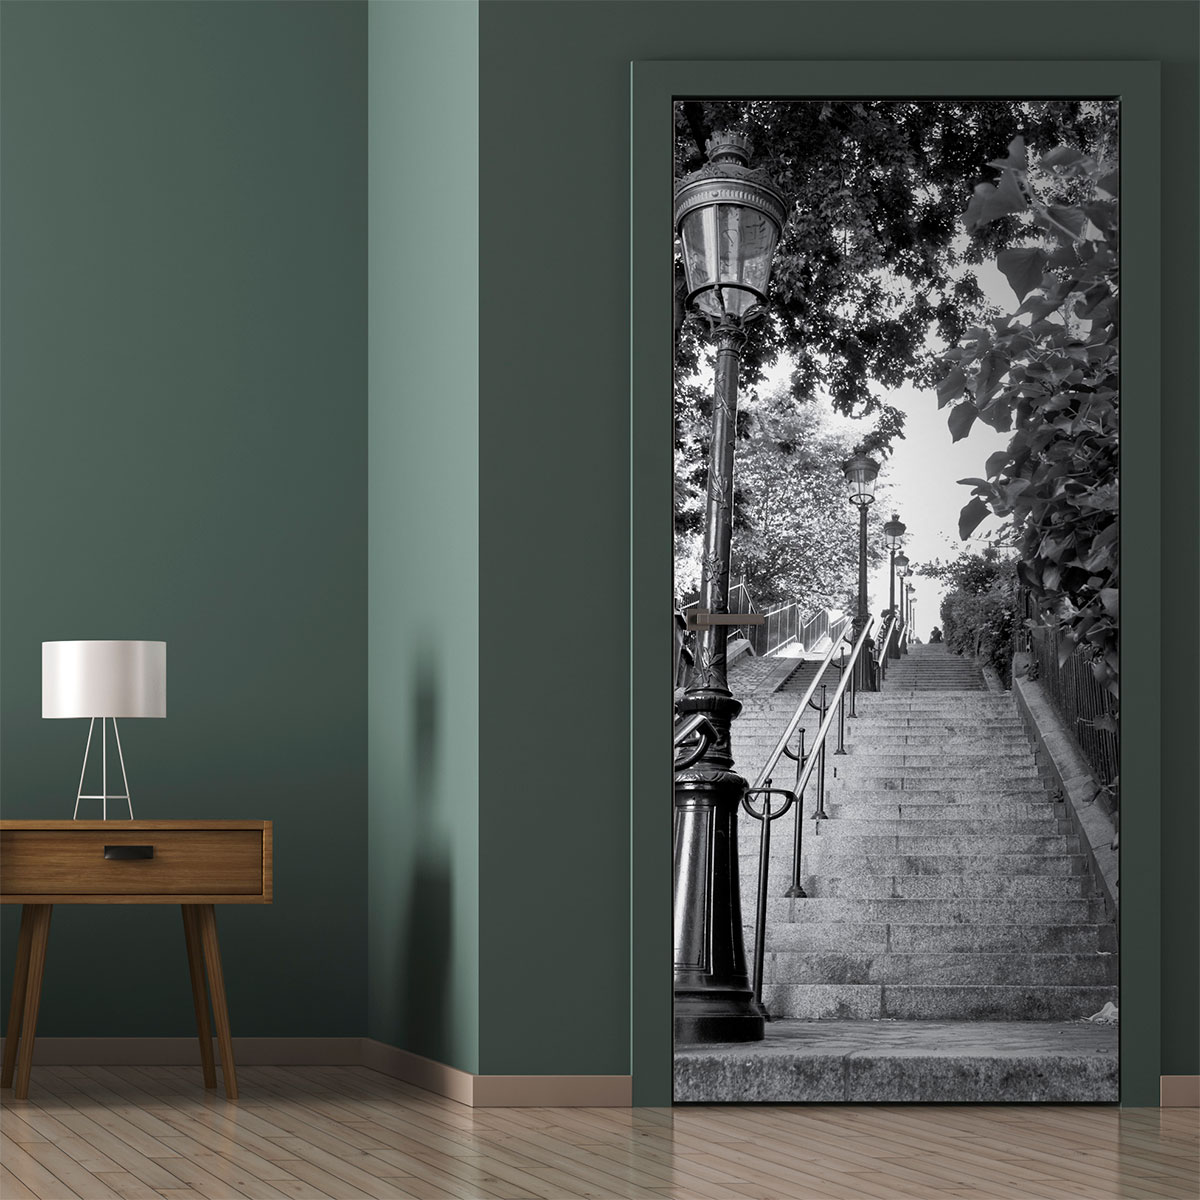 sticker porte 204 x 83 cm escalier parisien stickers. Black Bedroom Furniture Sets. Home Design Ideas